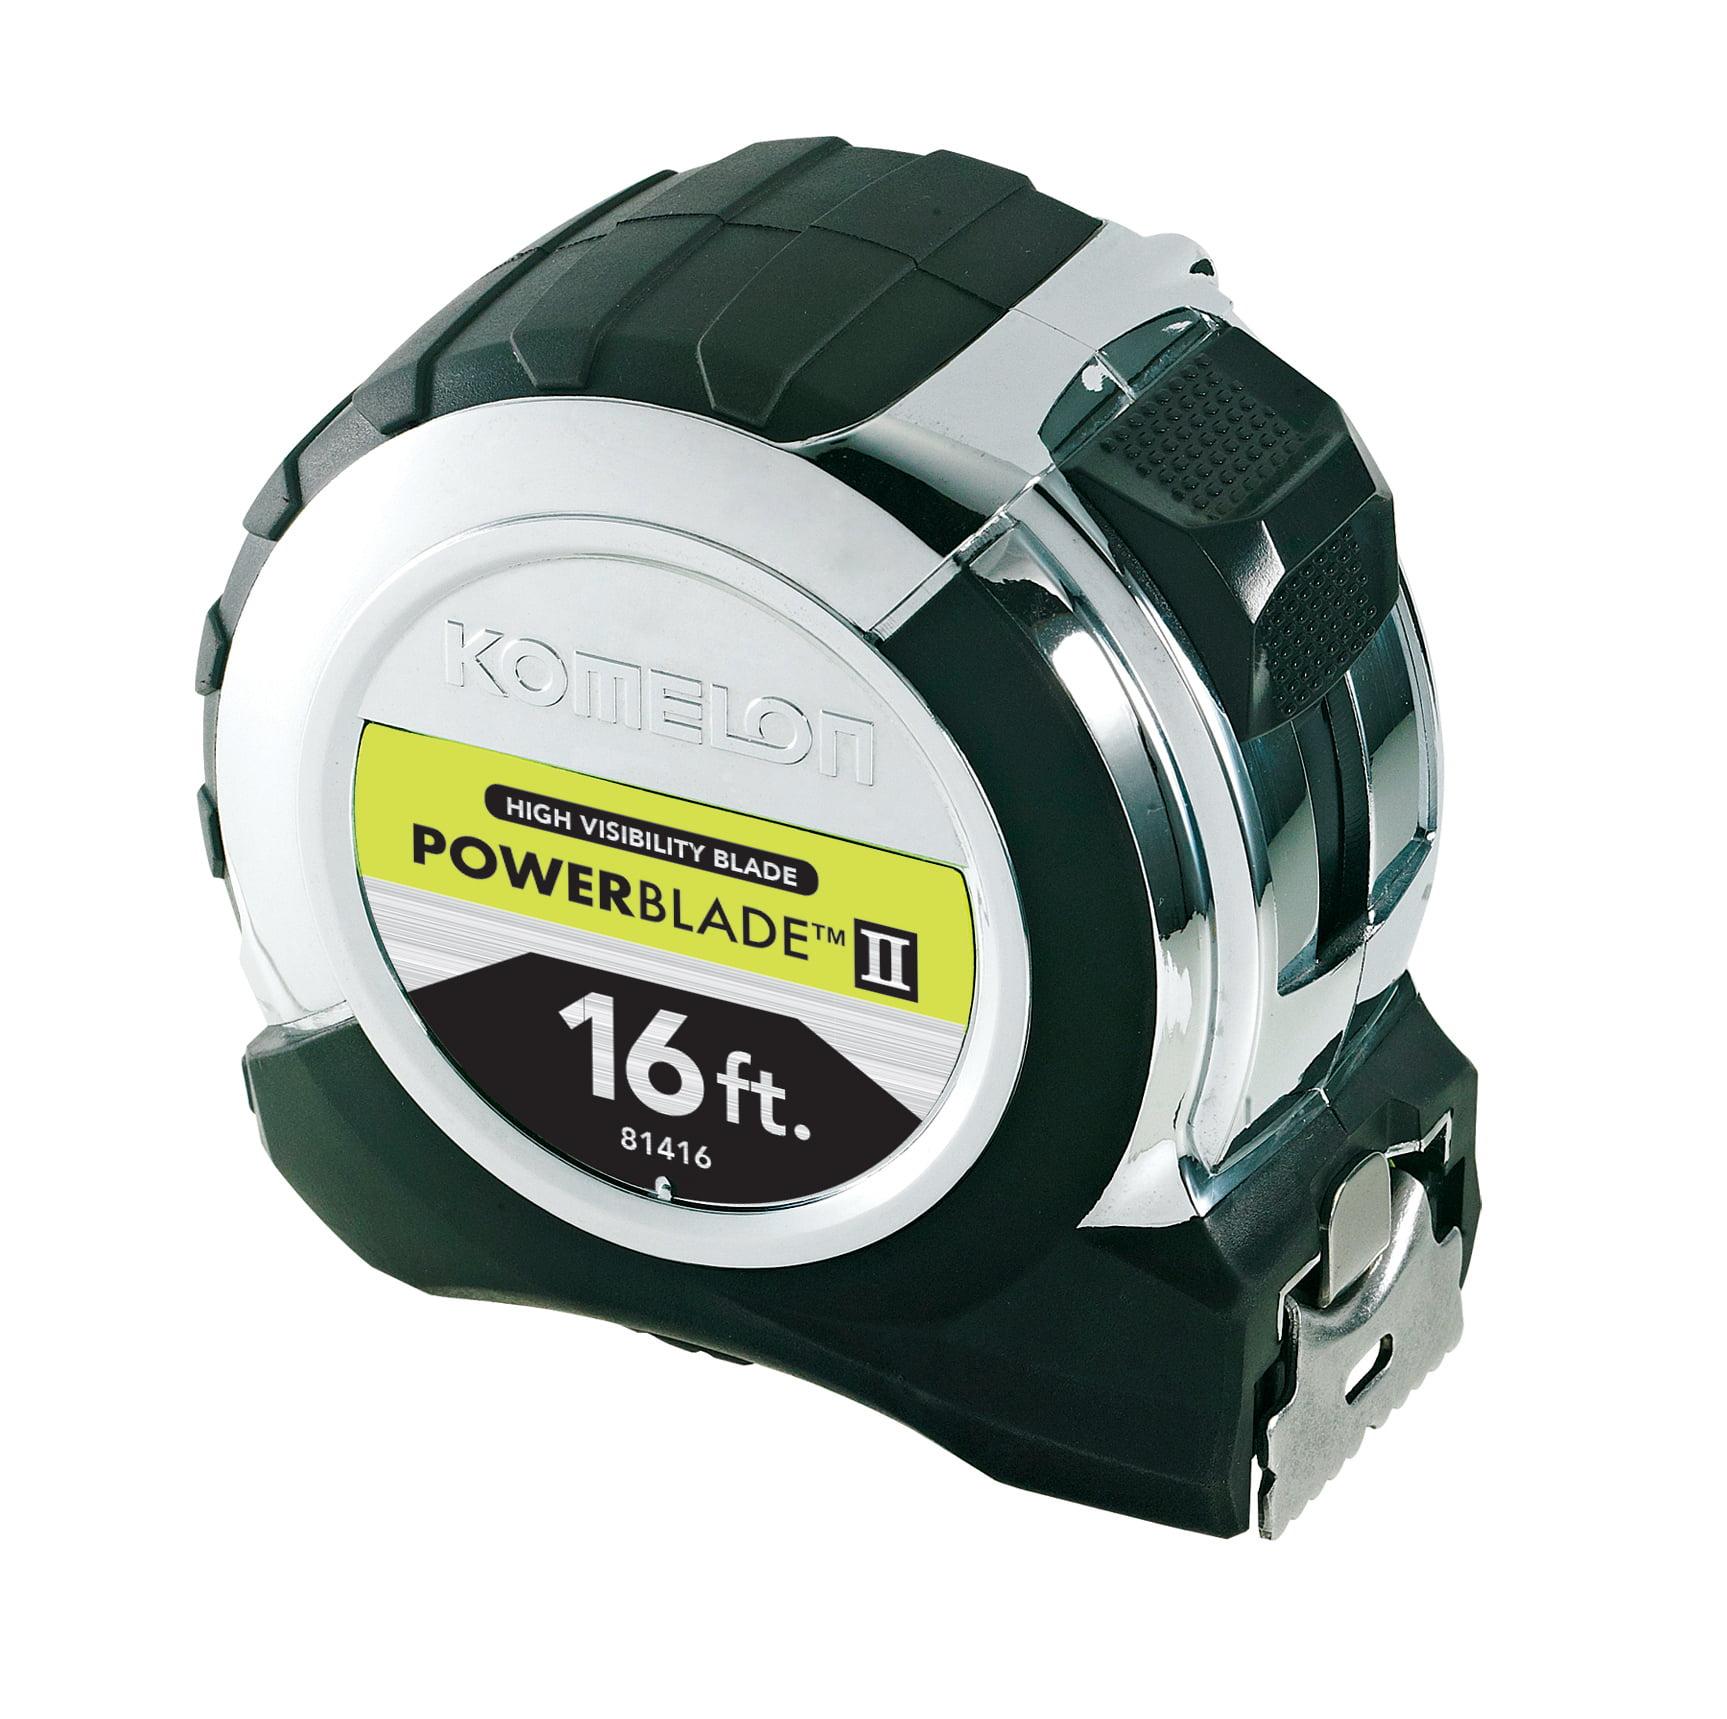 Komelon 16ft Chrome Powerblade II Tape Measure